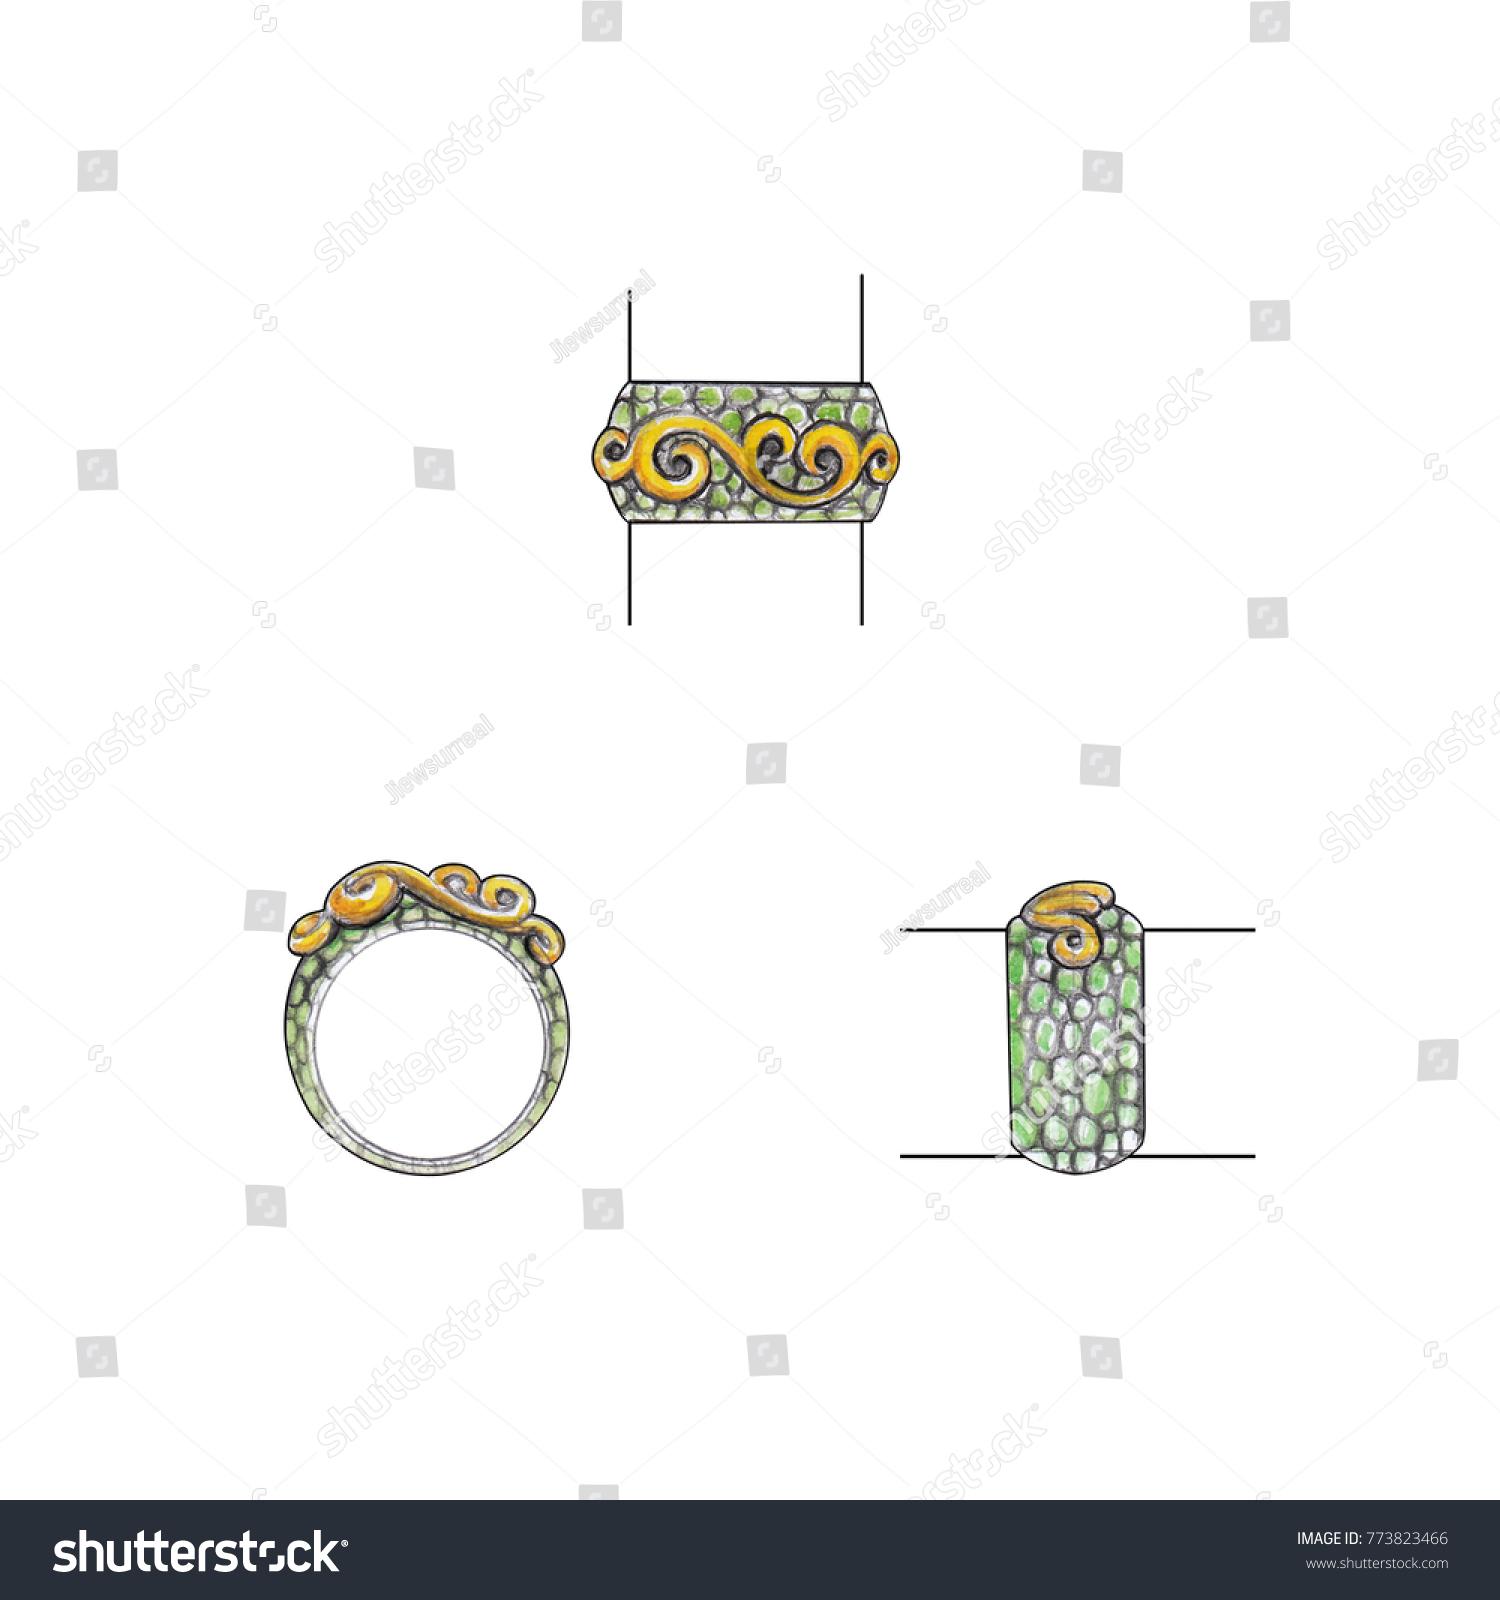 Jewelry Design Vintage Gold On Stingray Stock Illustration 773823466 ...